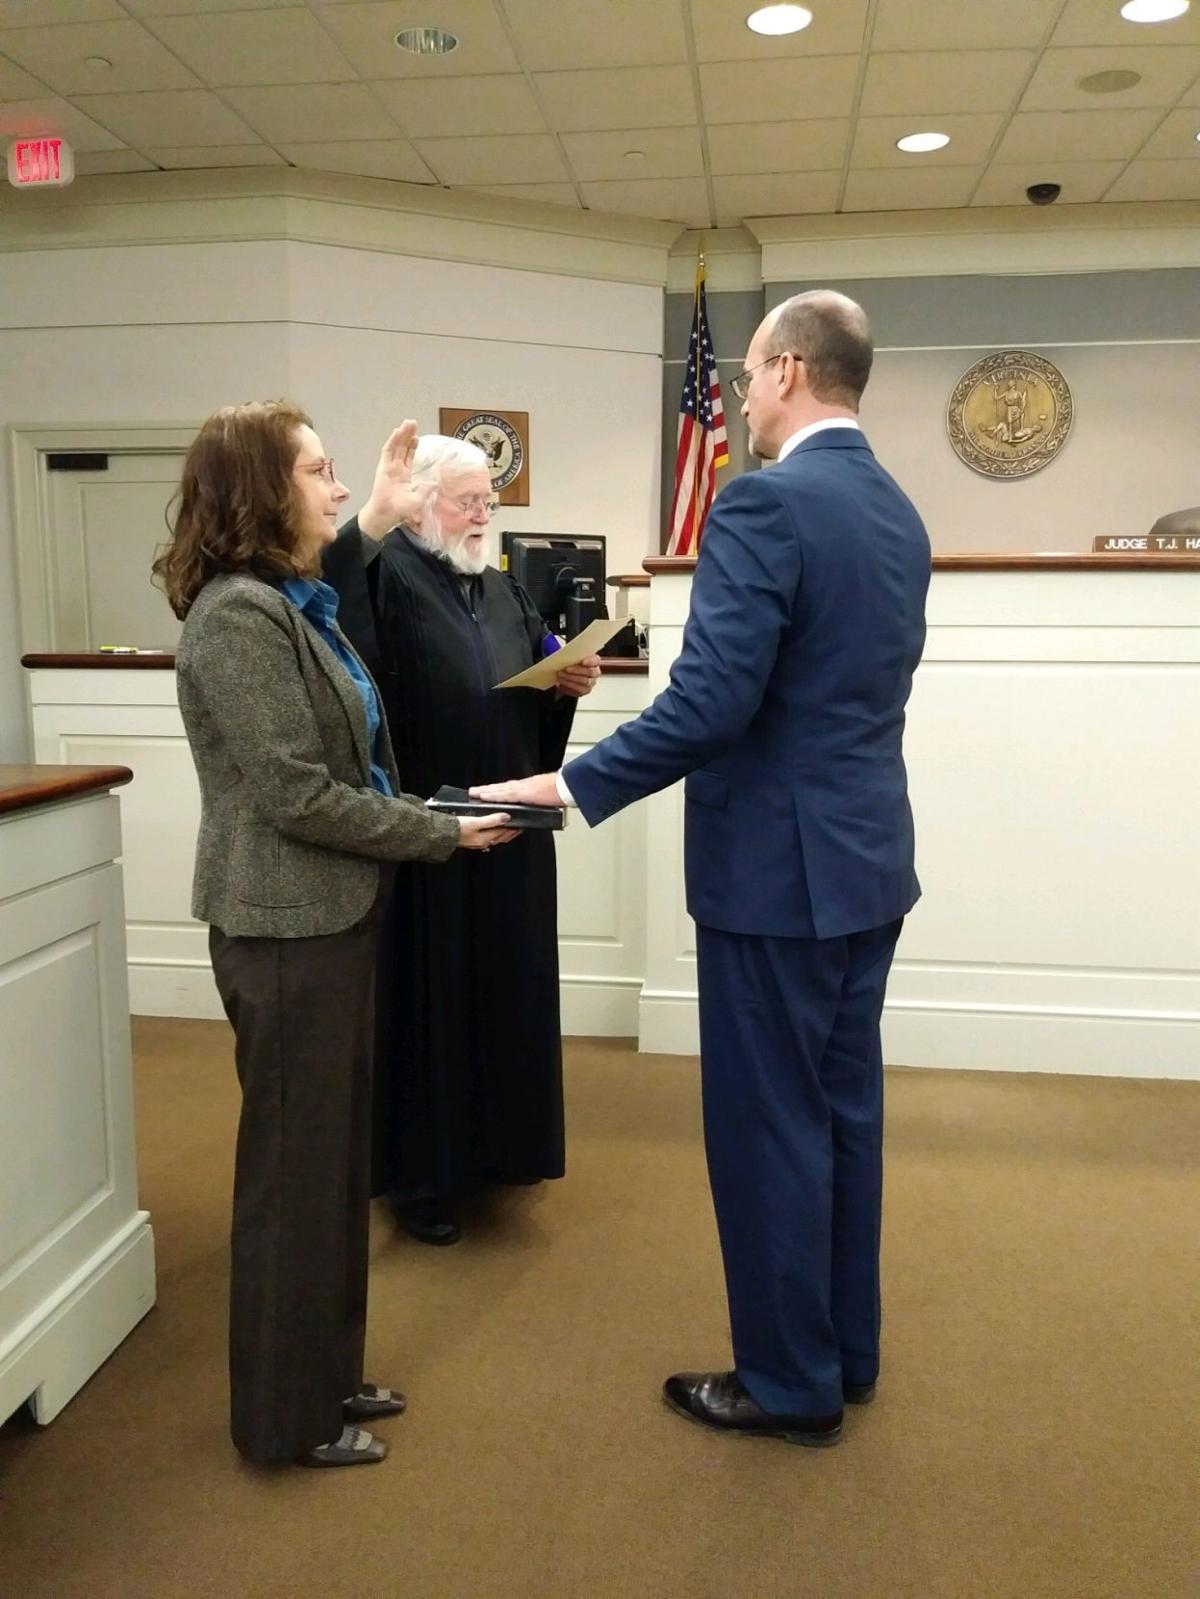 Scott Miles is sworn in as Chief Circuit Judge T.J. Hauler